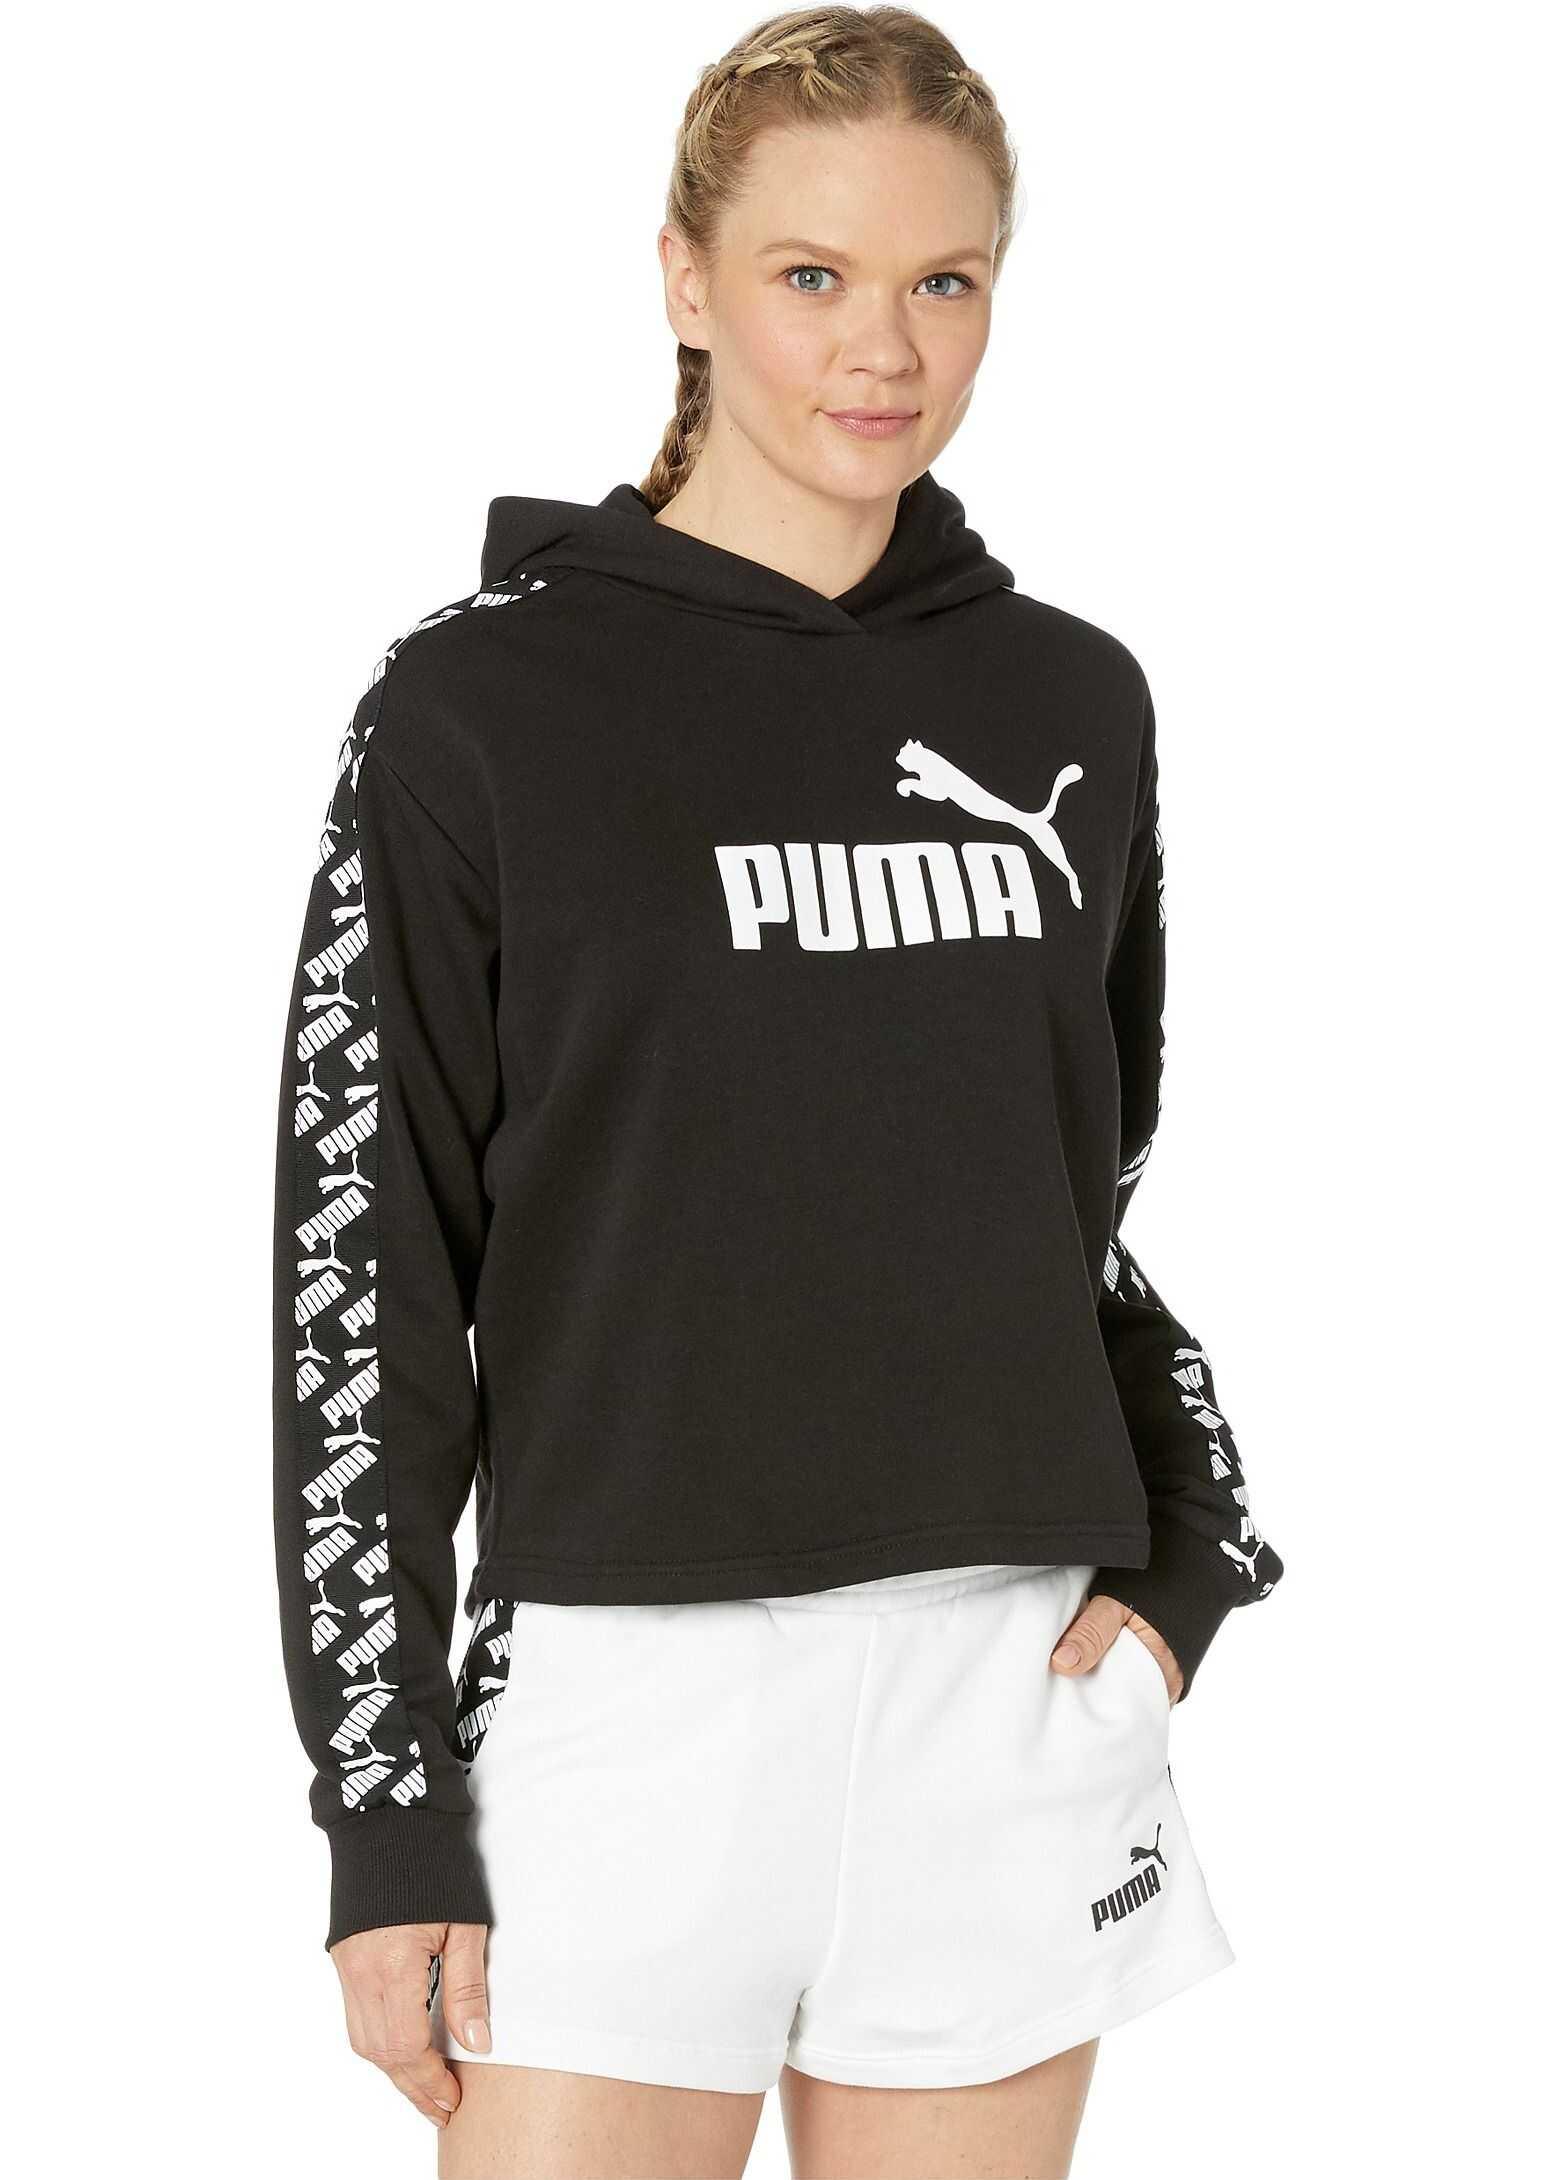 PUMA Amplified Cropped Hoodie PUMA Black